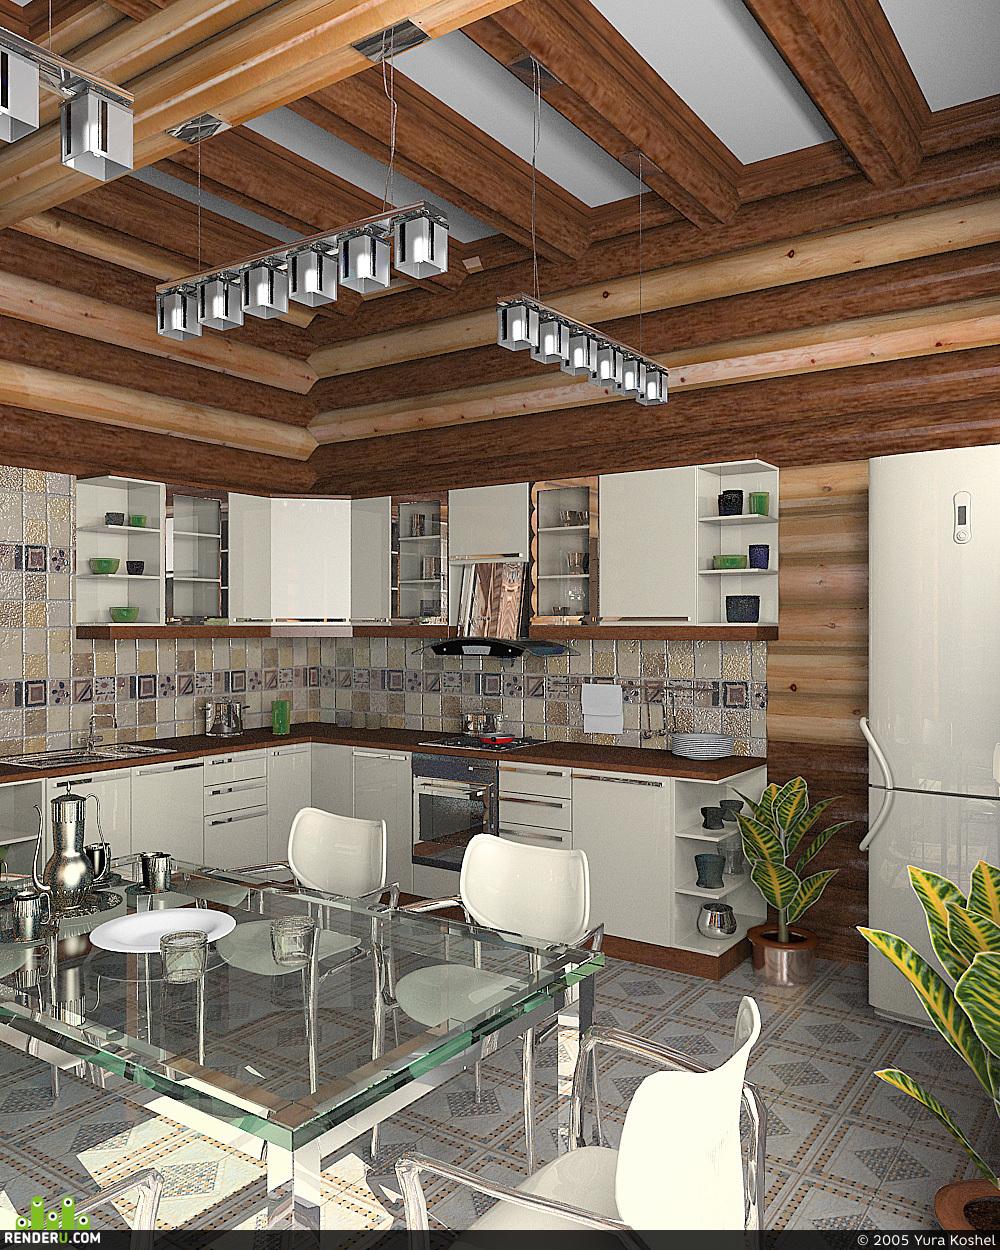 preview кухня в деревянном доме